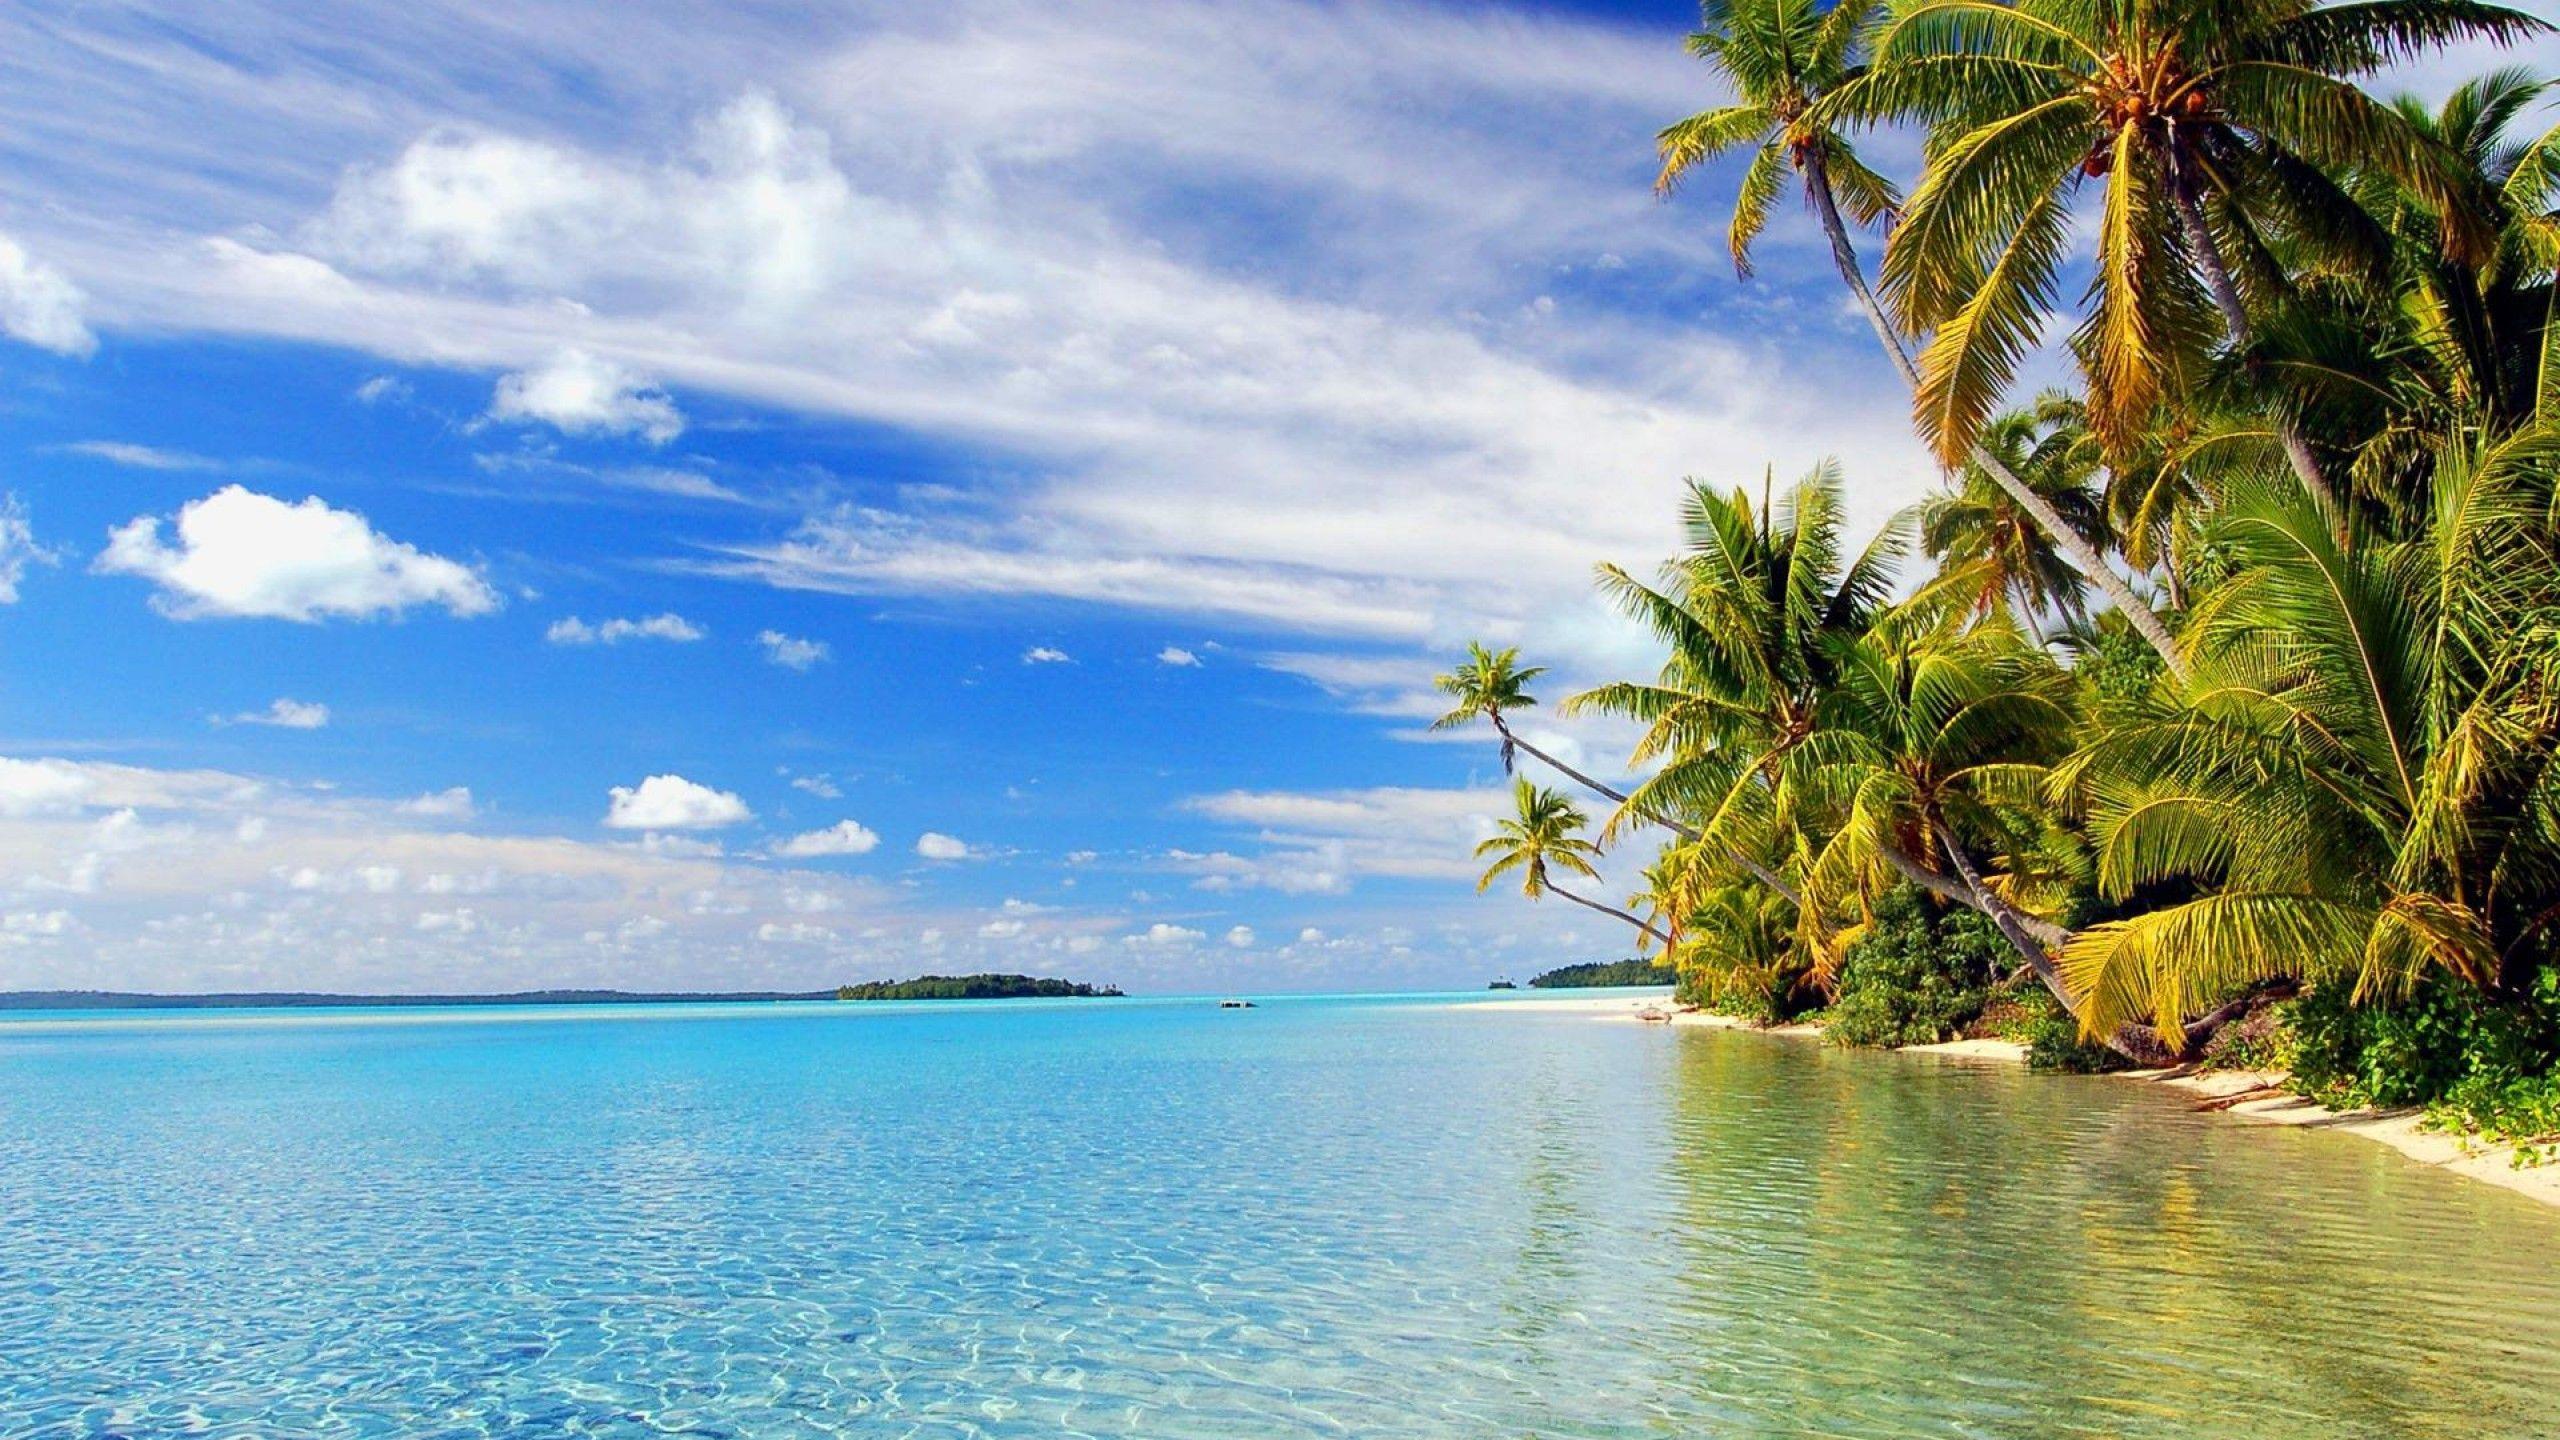 Tropical Beach Landscape Background